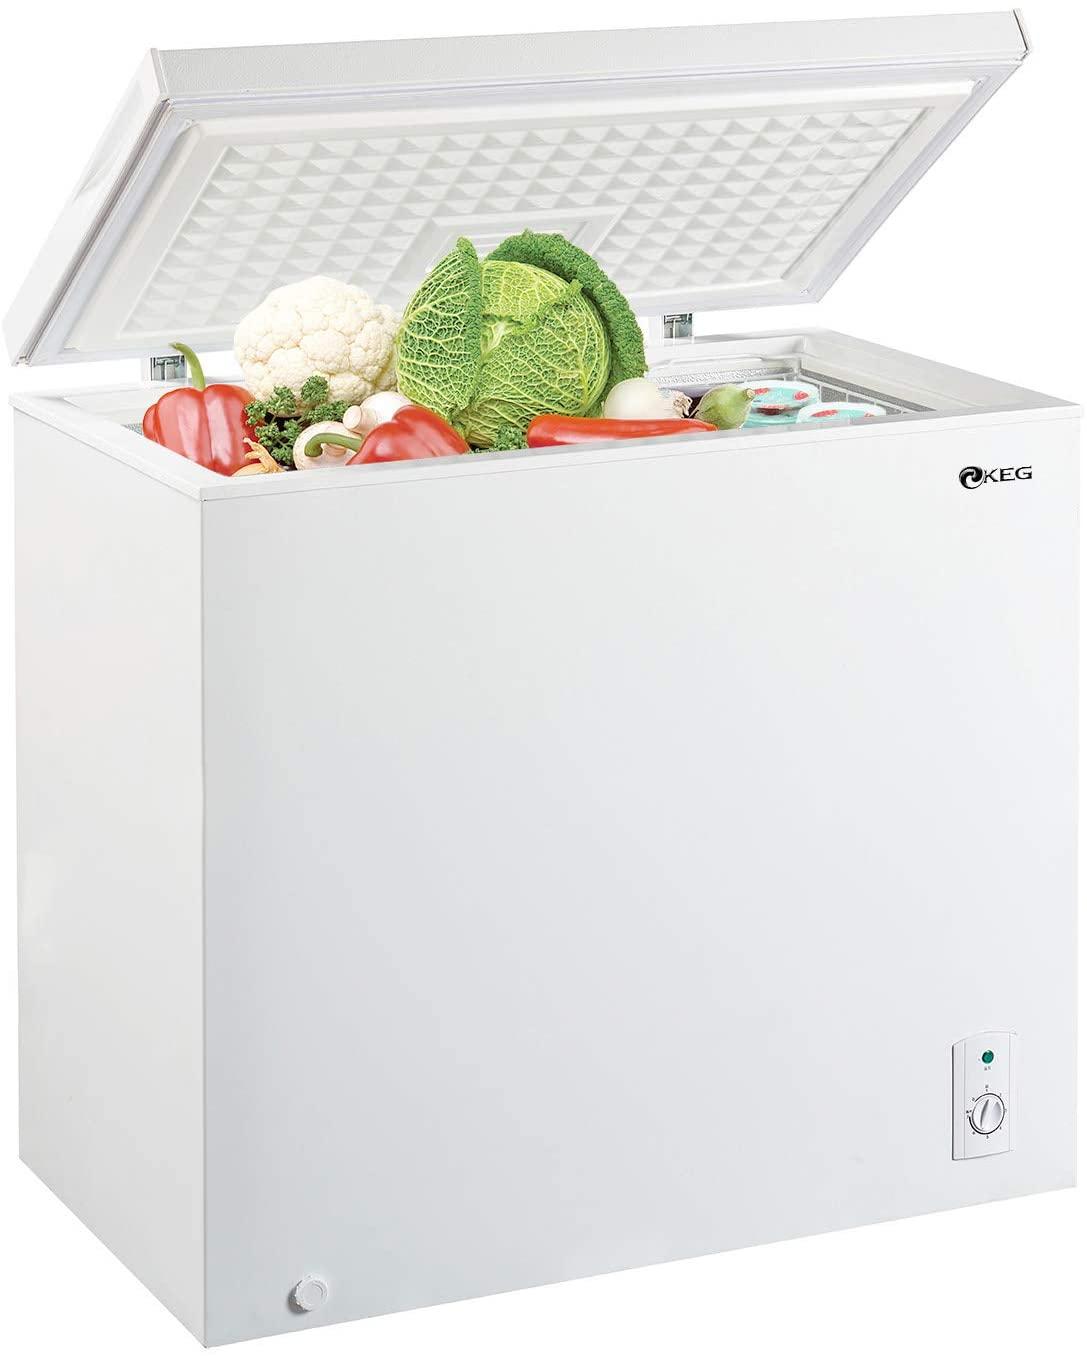 Freezer 7.1 CFT KEG